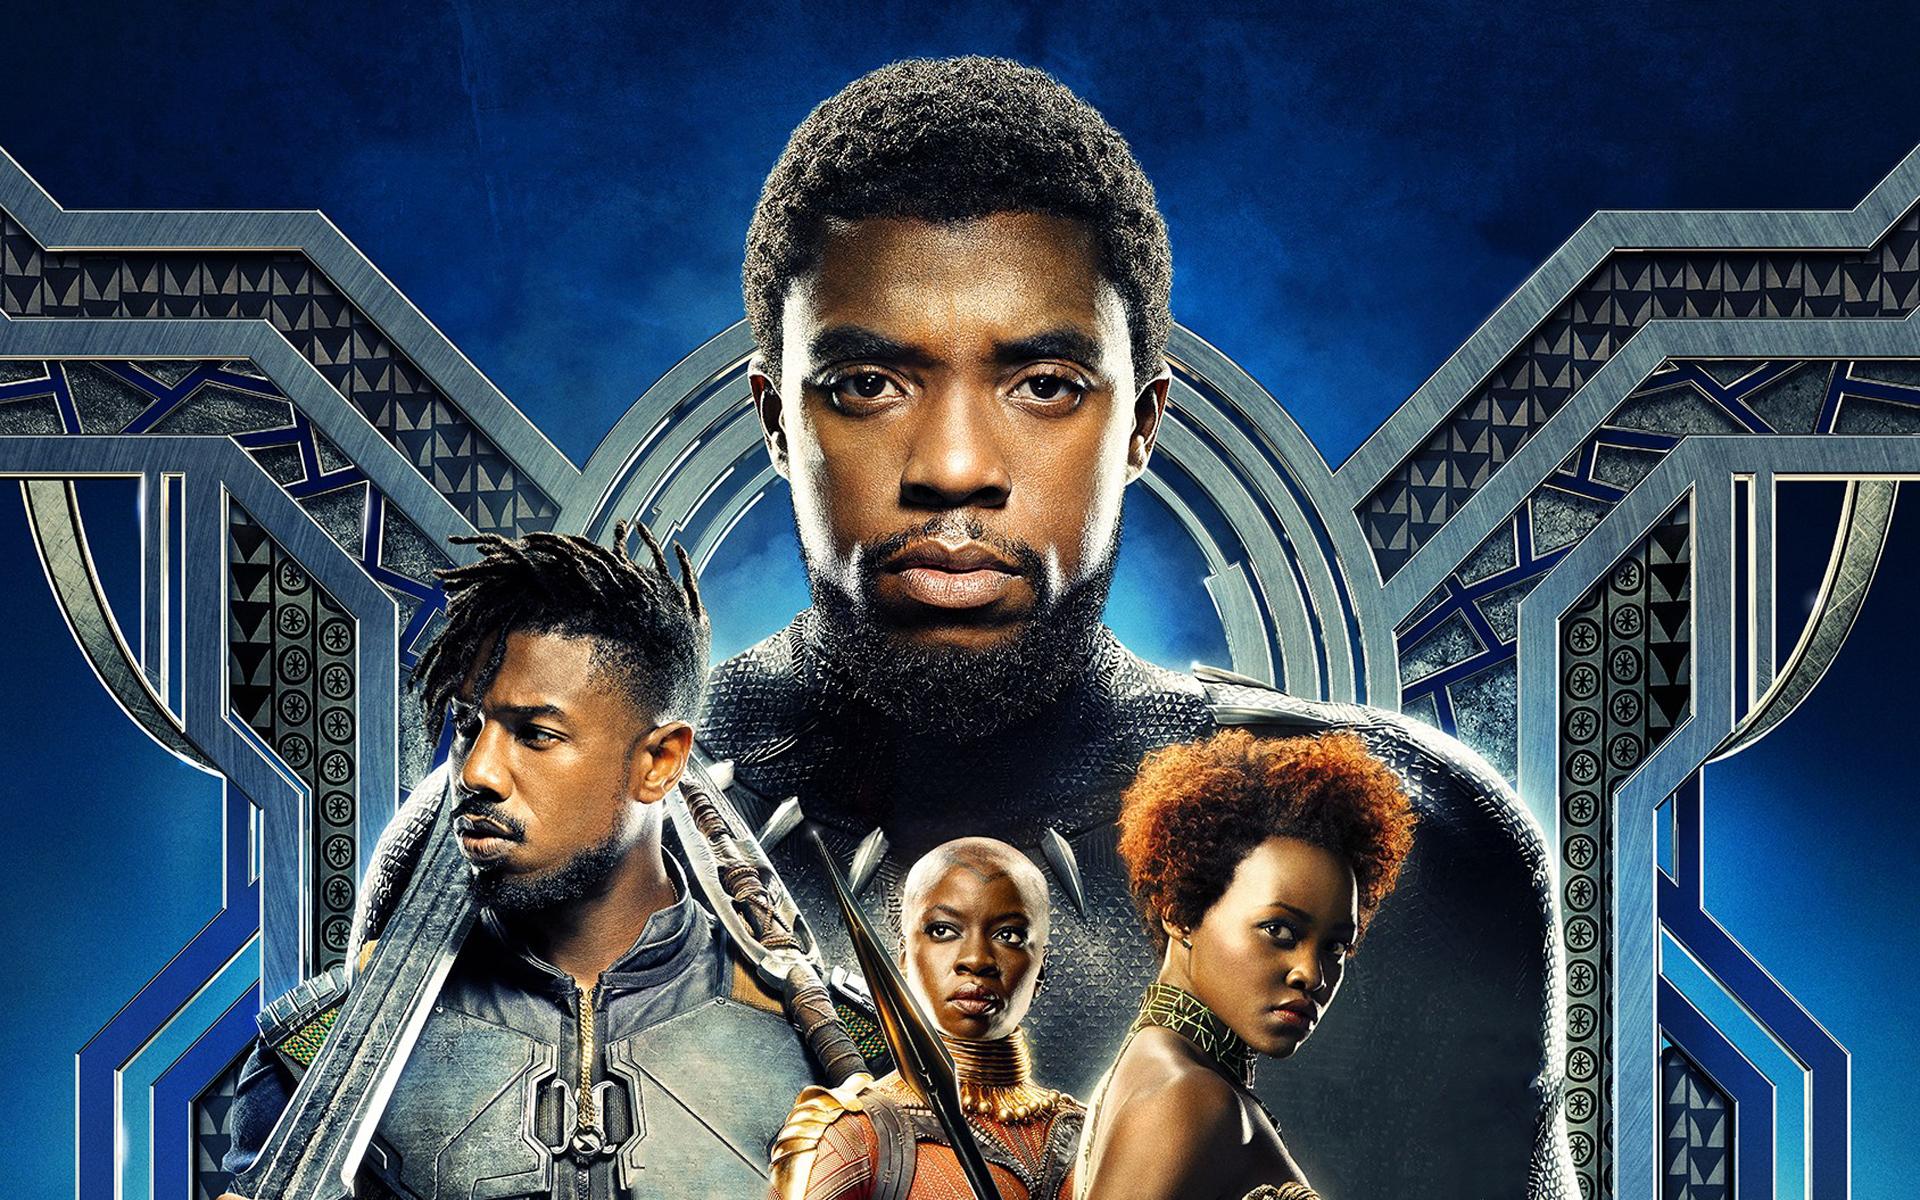 540x960 Black Panther 2018 Movie 540x960 Resolution